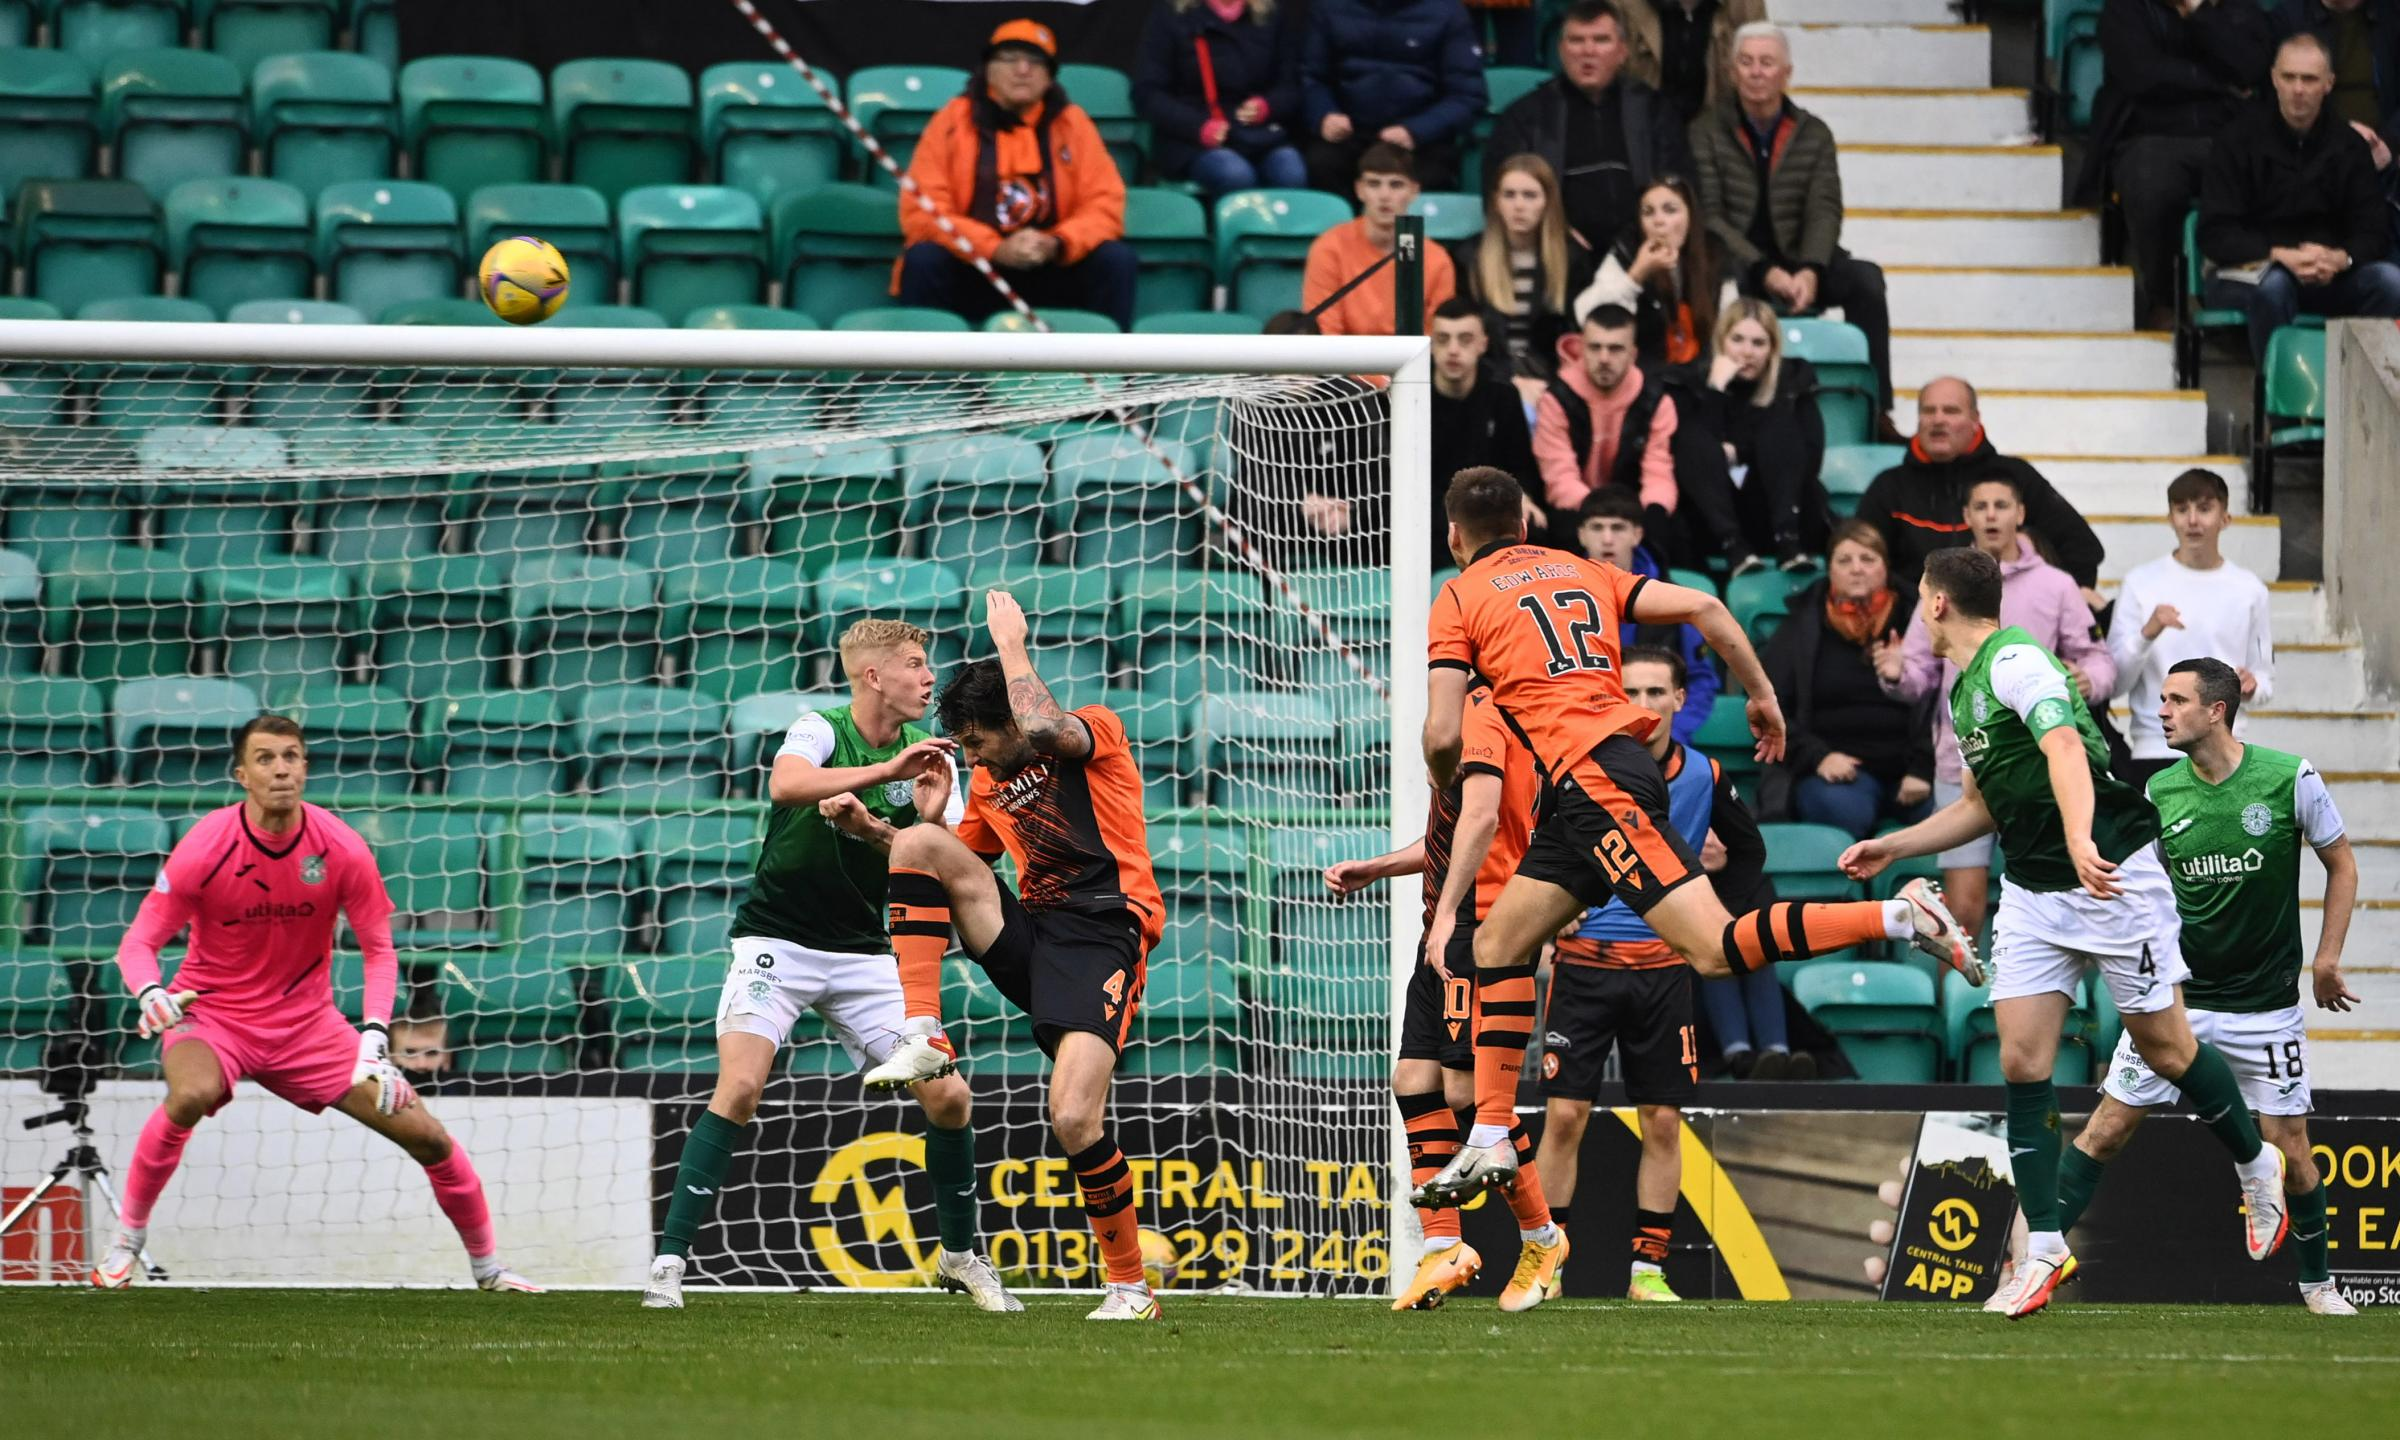 Hibernian 0-3 Dundee United: Jack Ross blasts 'lazy' display